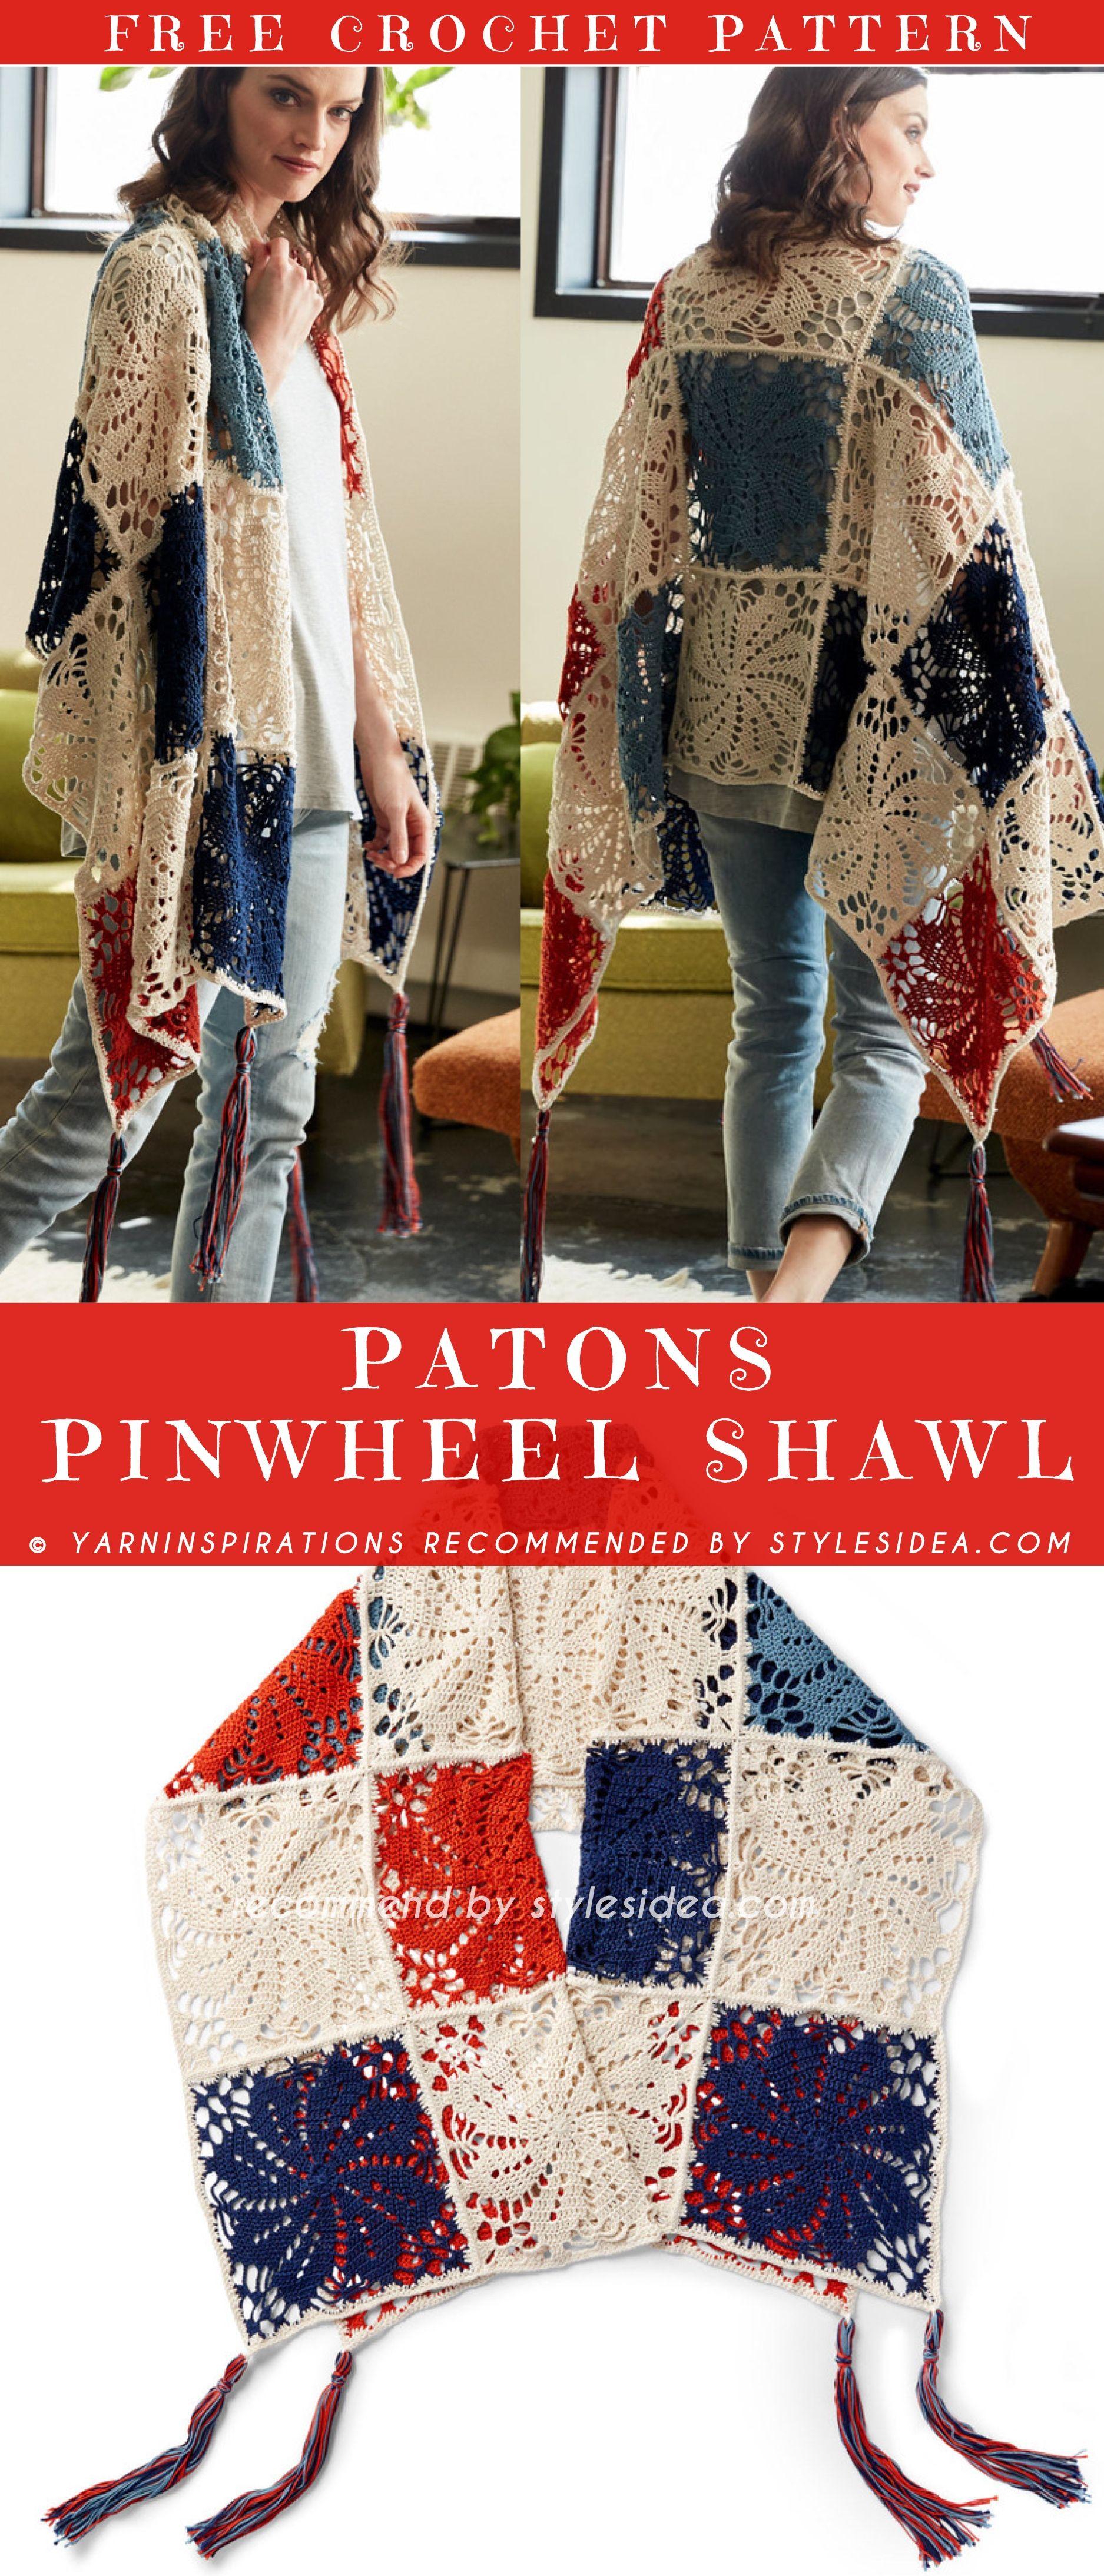 Stunning Evening Shawls Free Crochet Pattern | Crochet shawl, Shawl ...